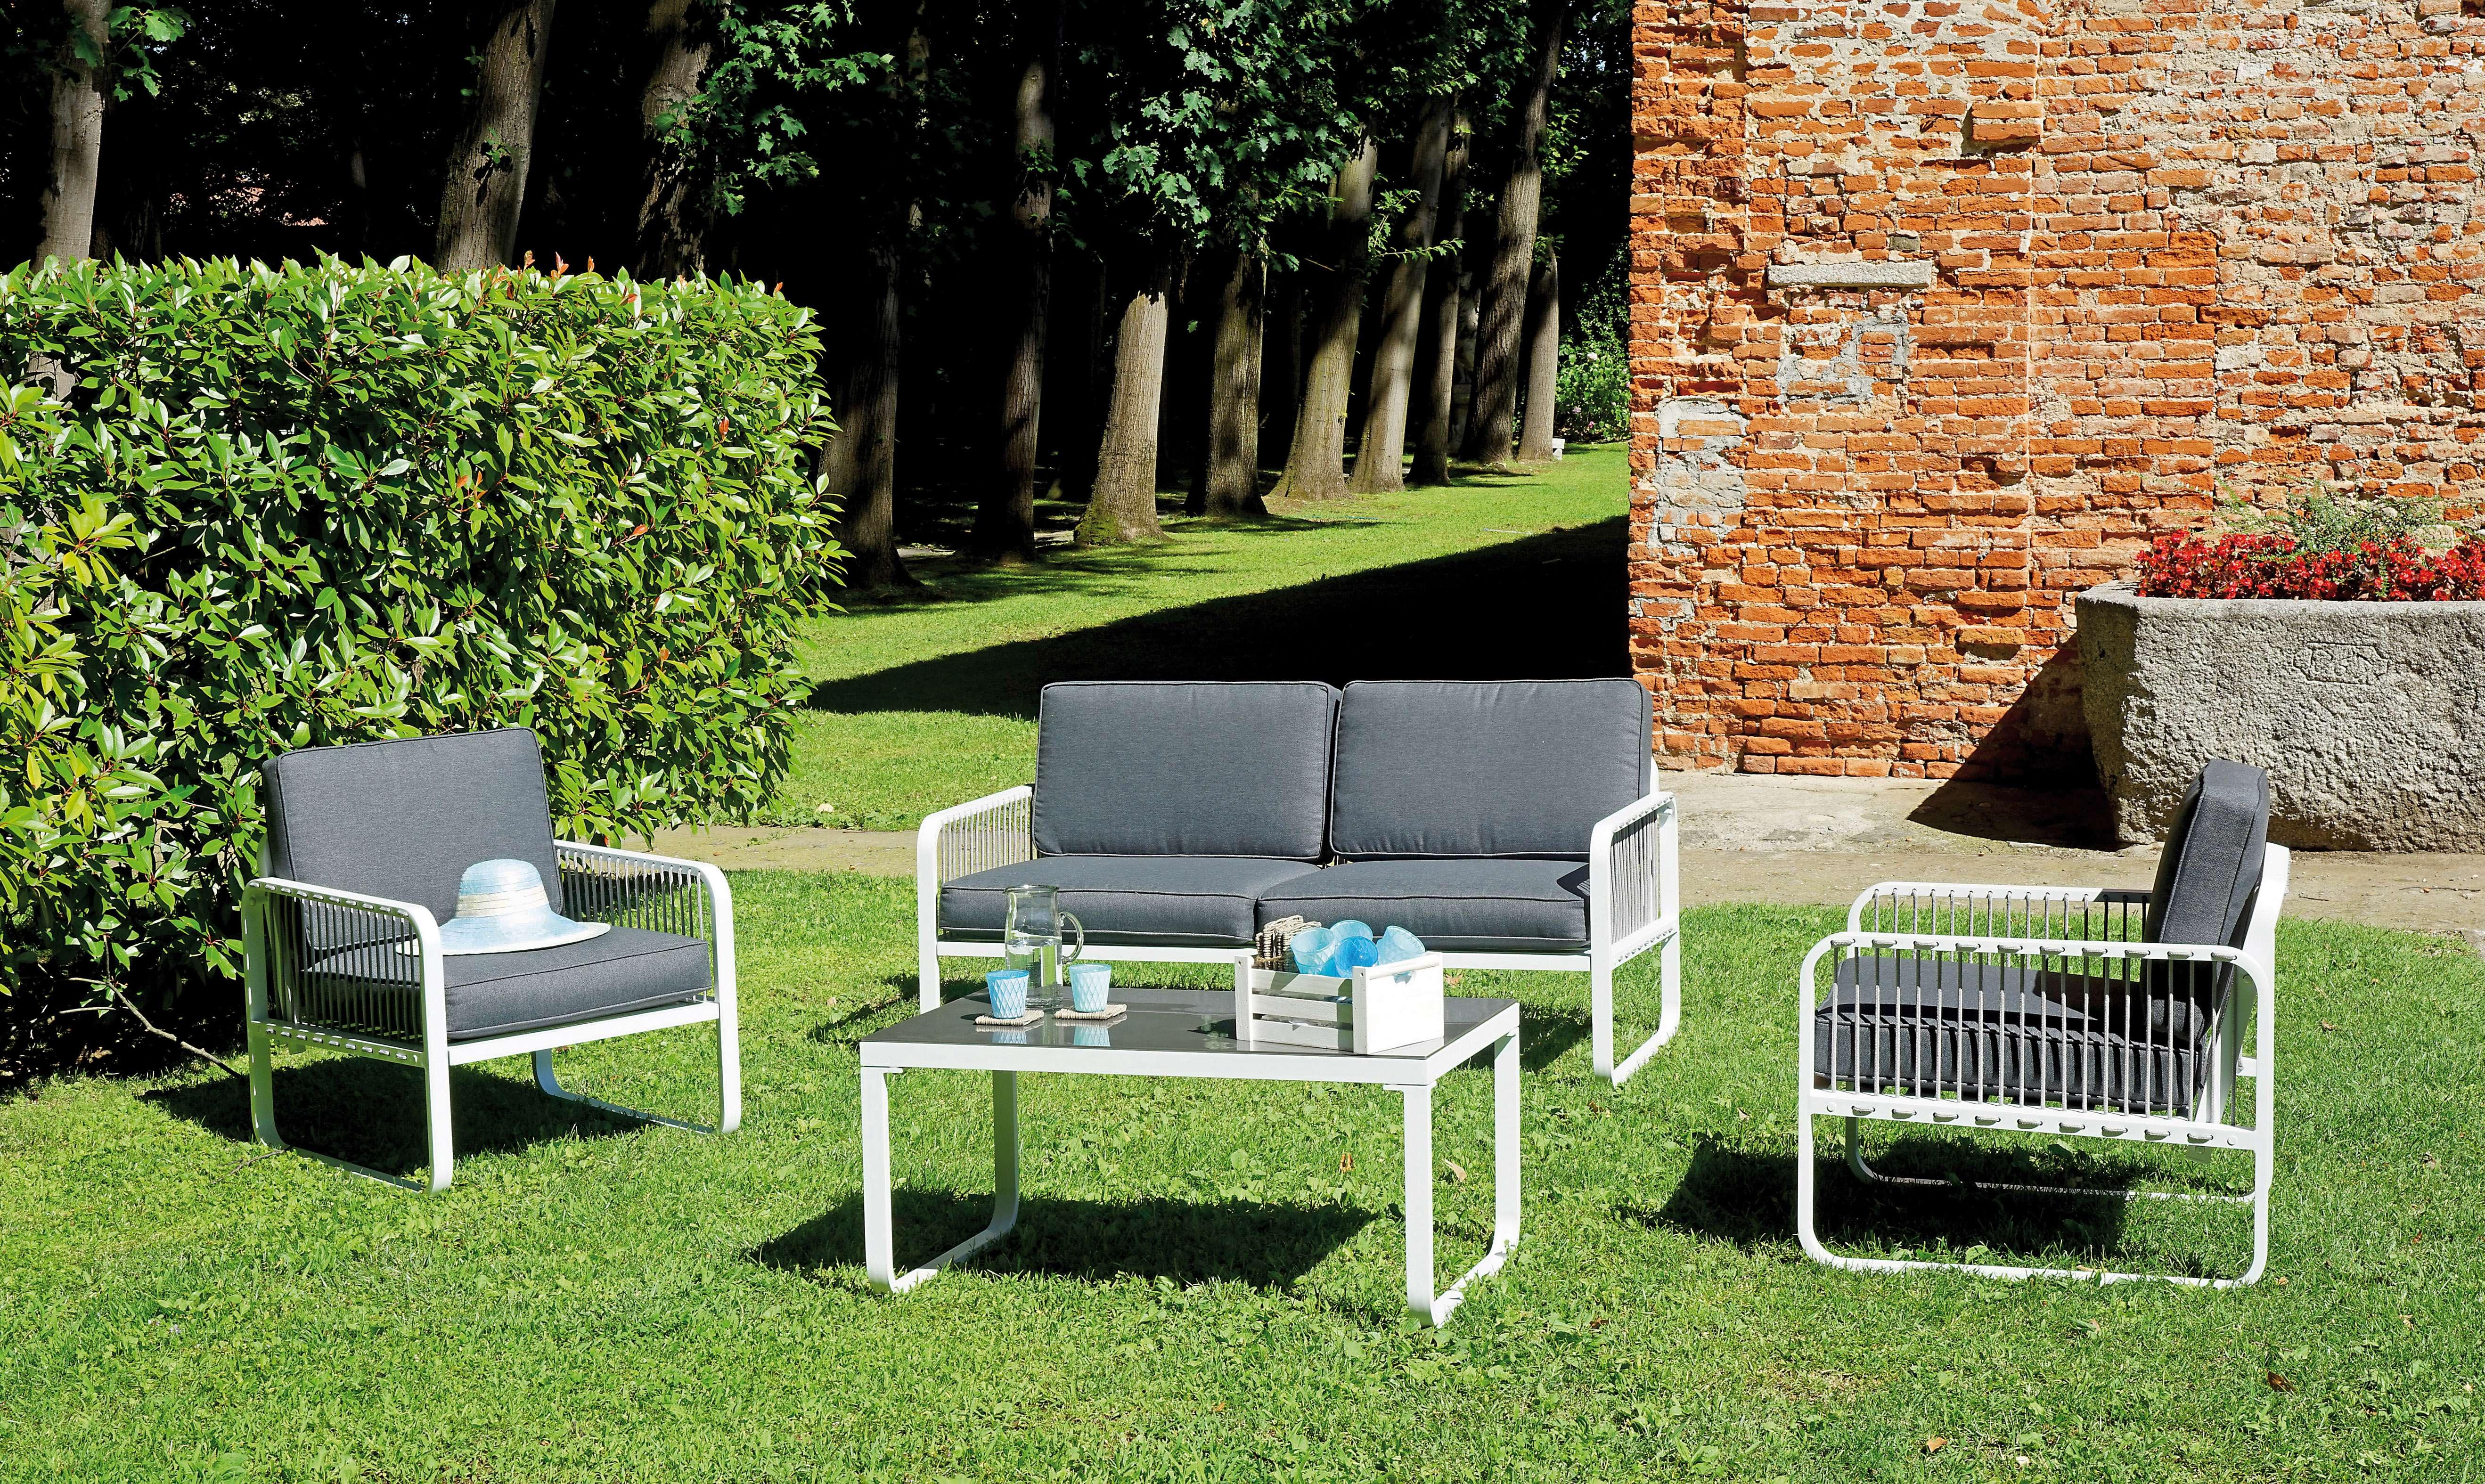 Set san fruttuoso greenwood mobili da giardino for Set mobili da giardino